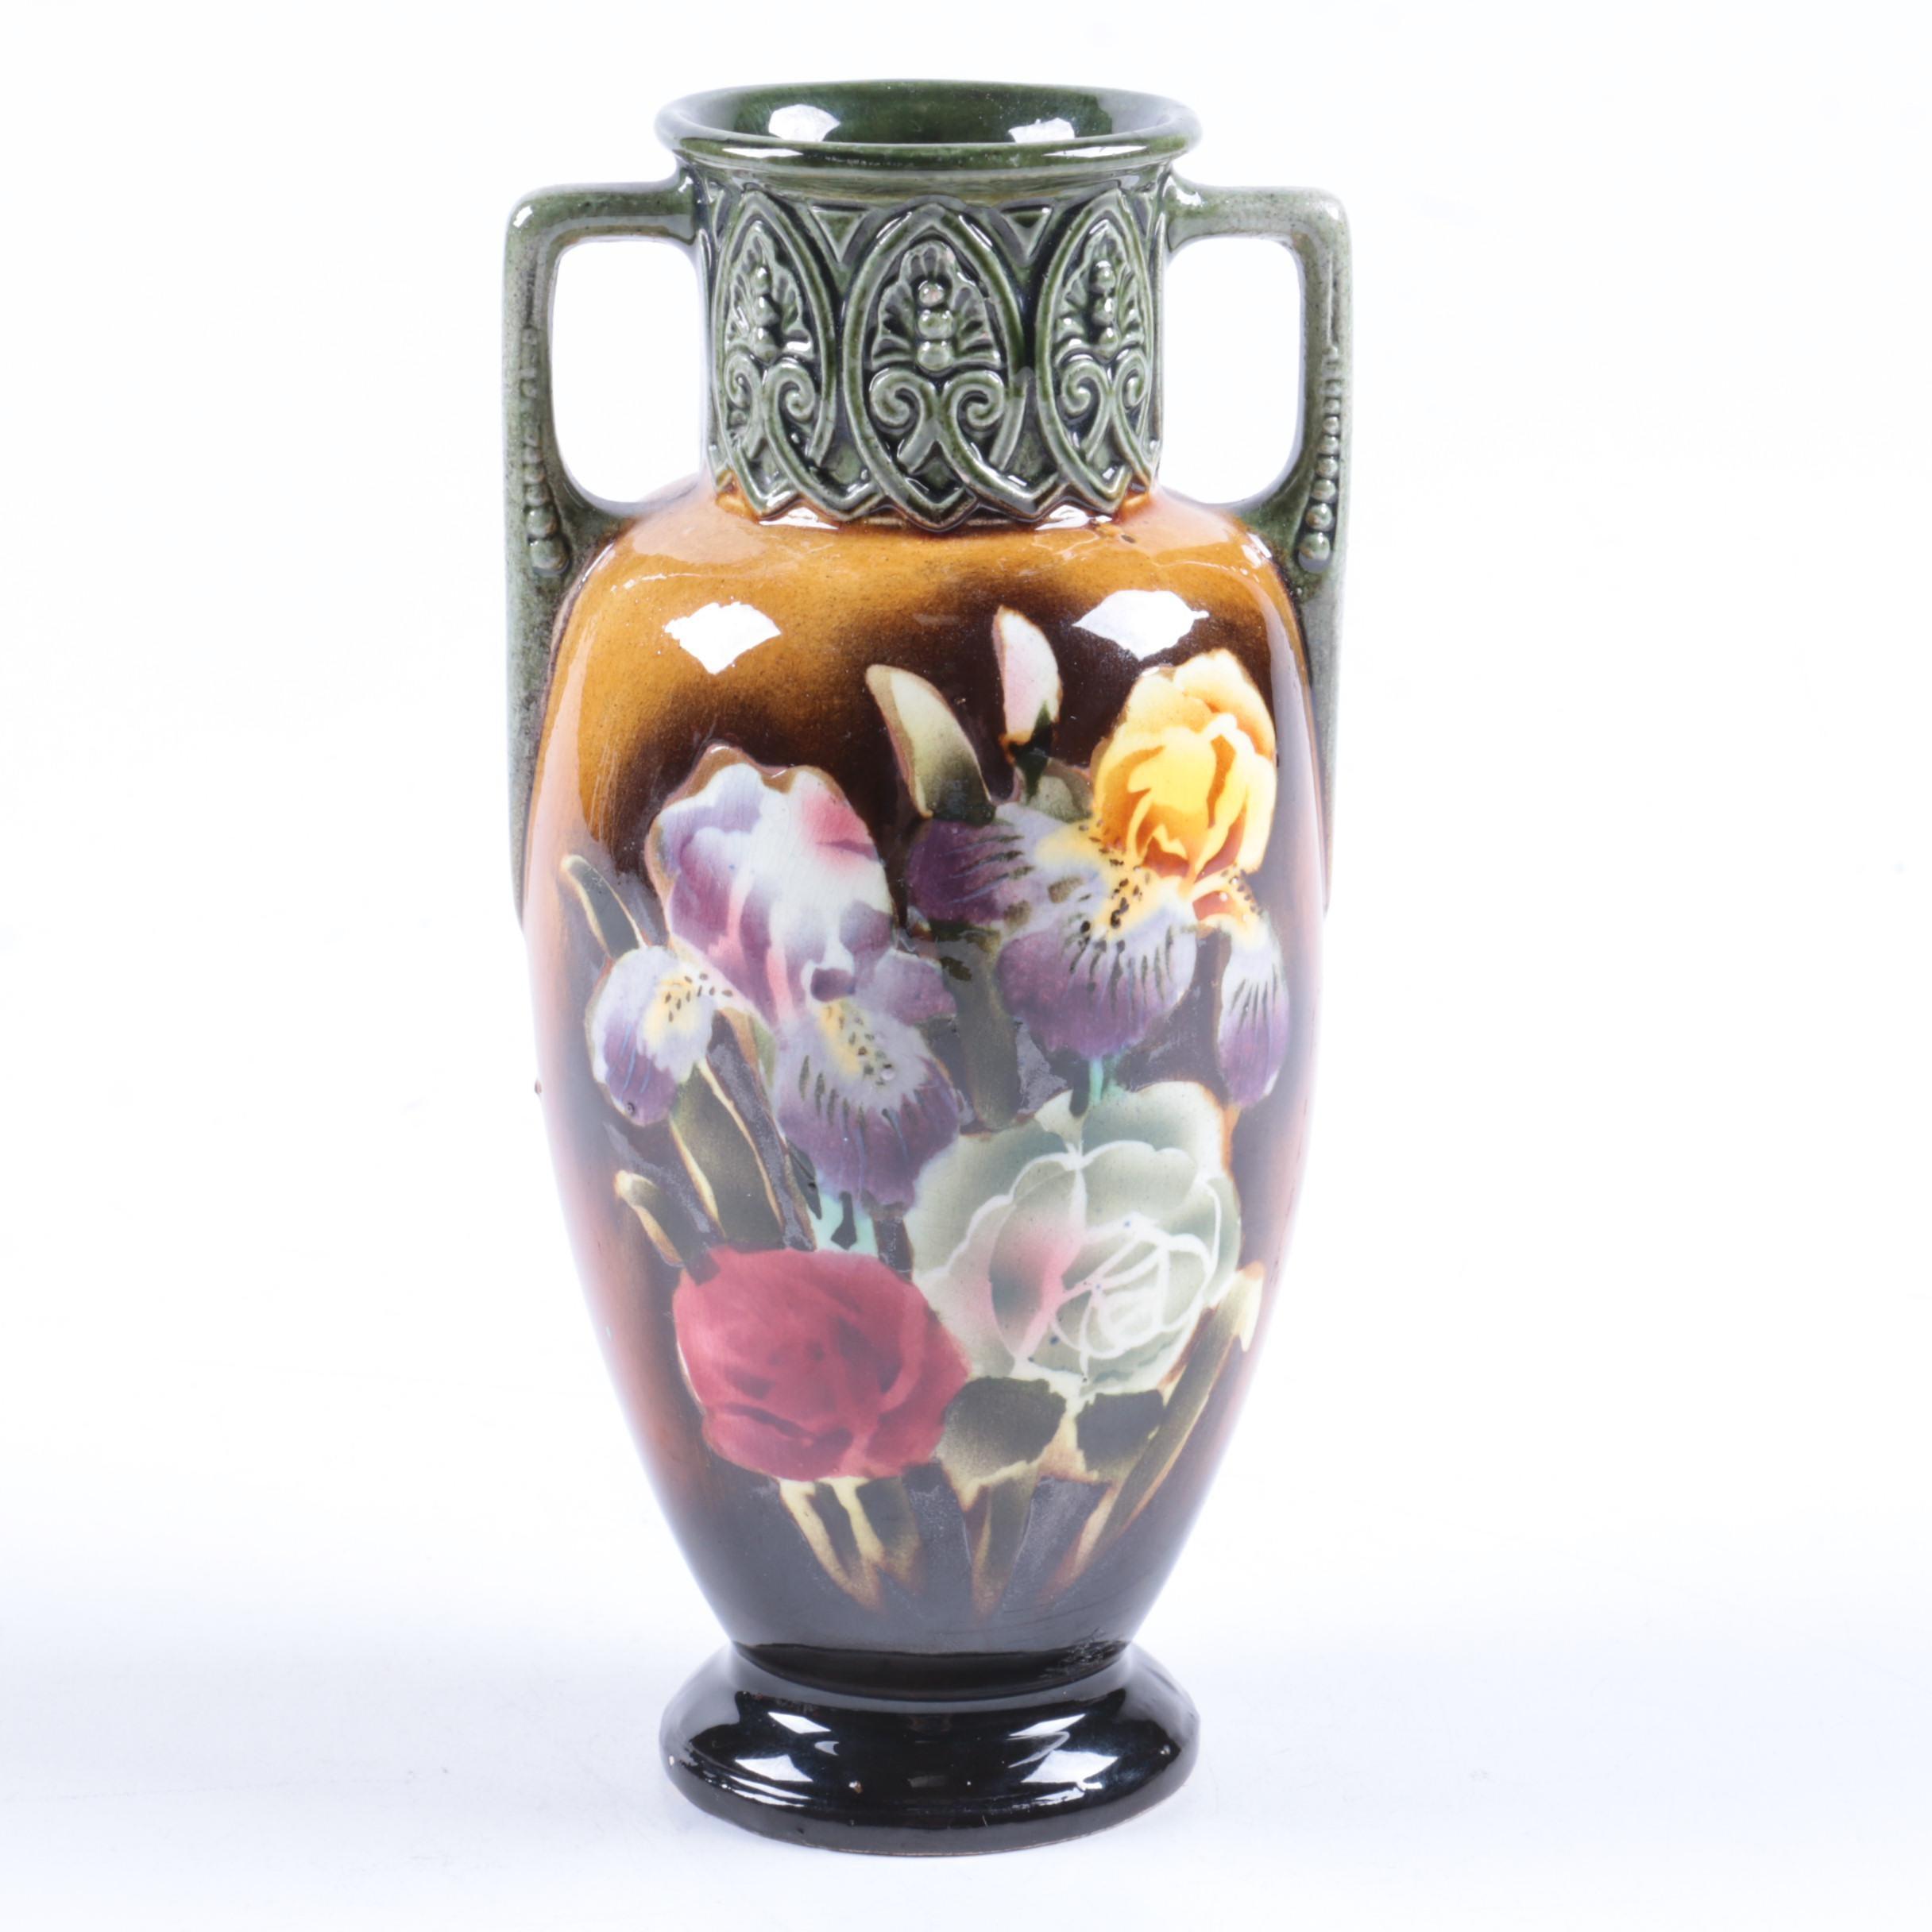 Czechoslovakian Floral Themed Ceramic Vase